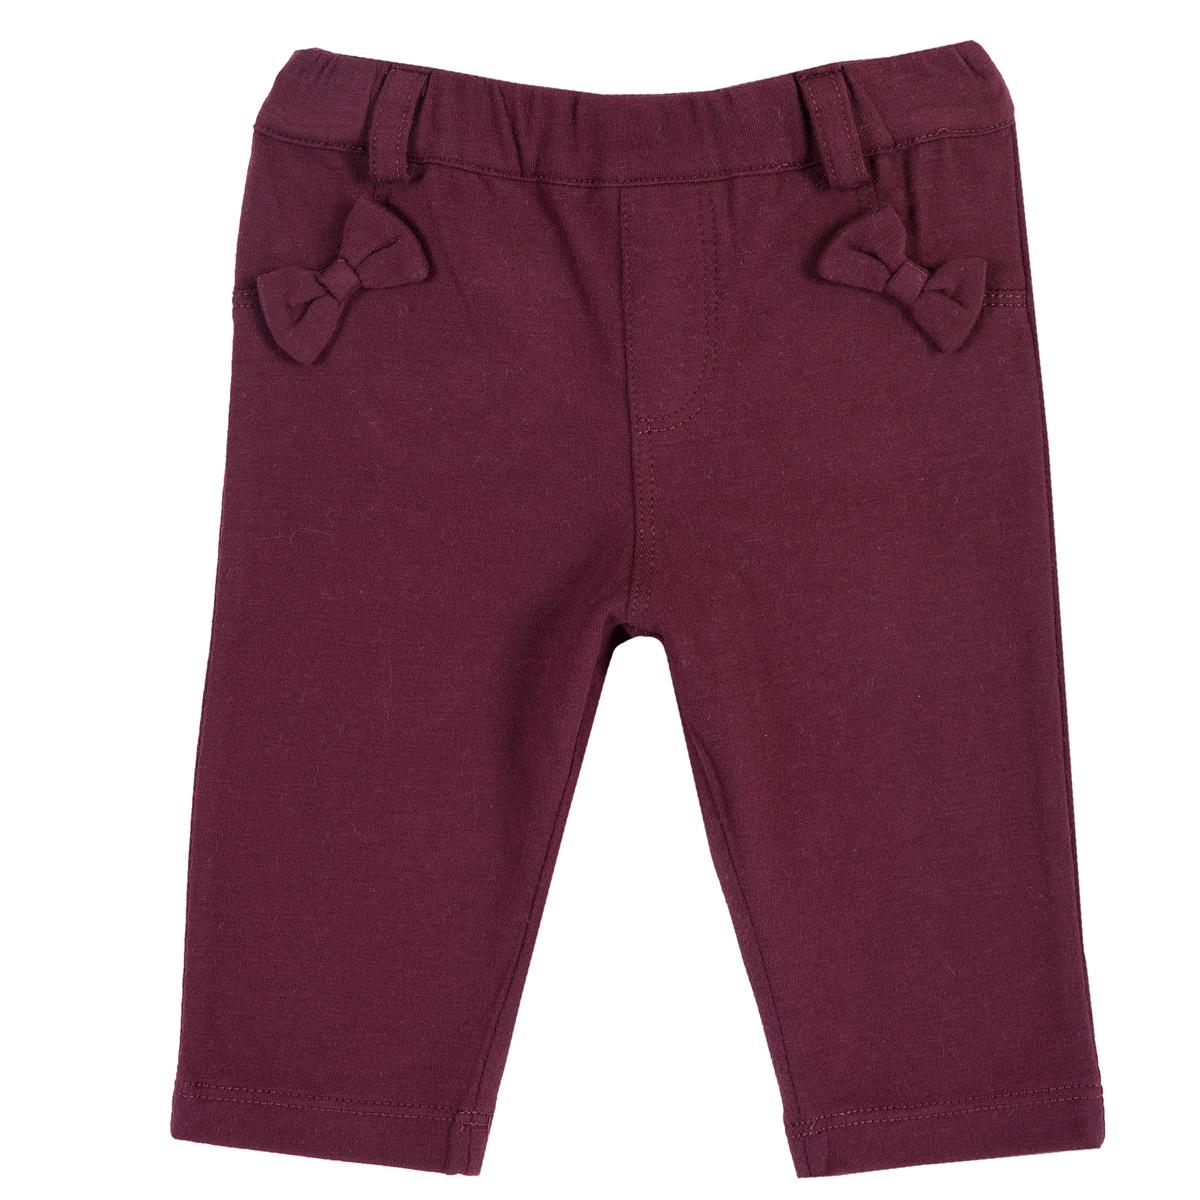 Pantaloni lungi copii Chicco fundite decorative